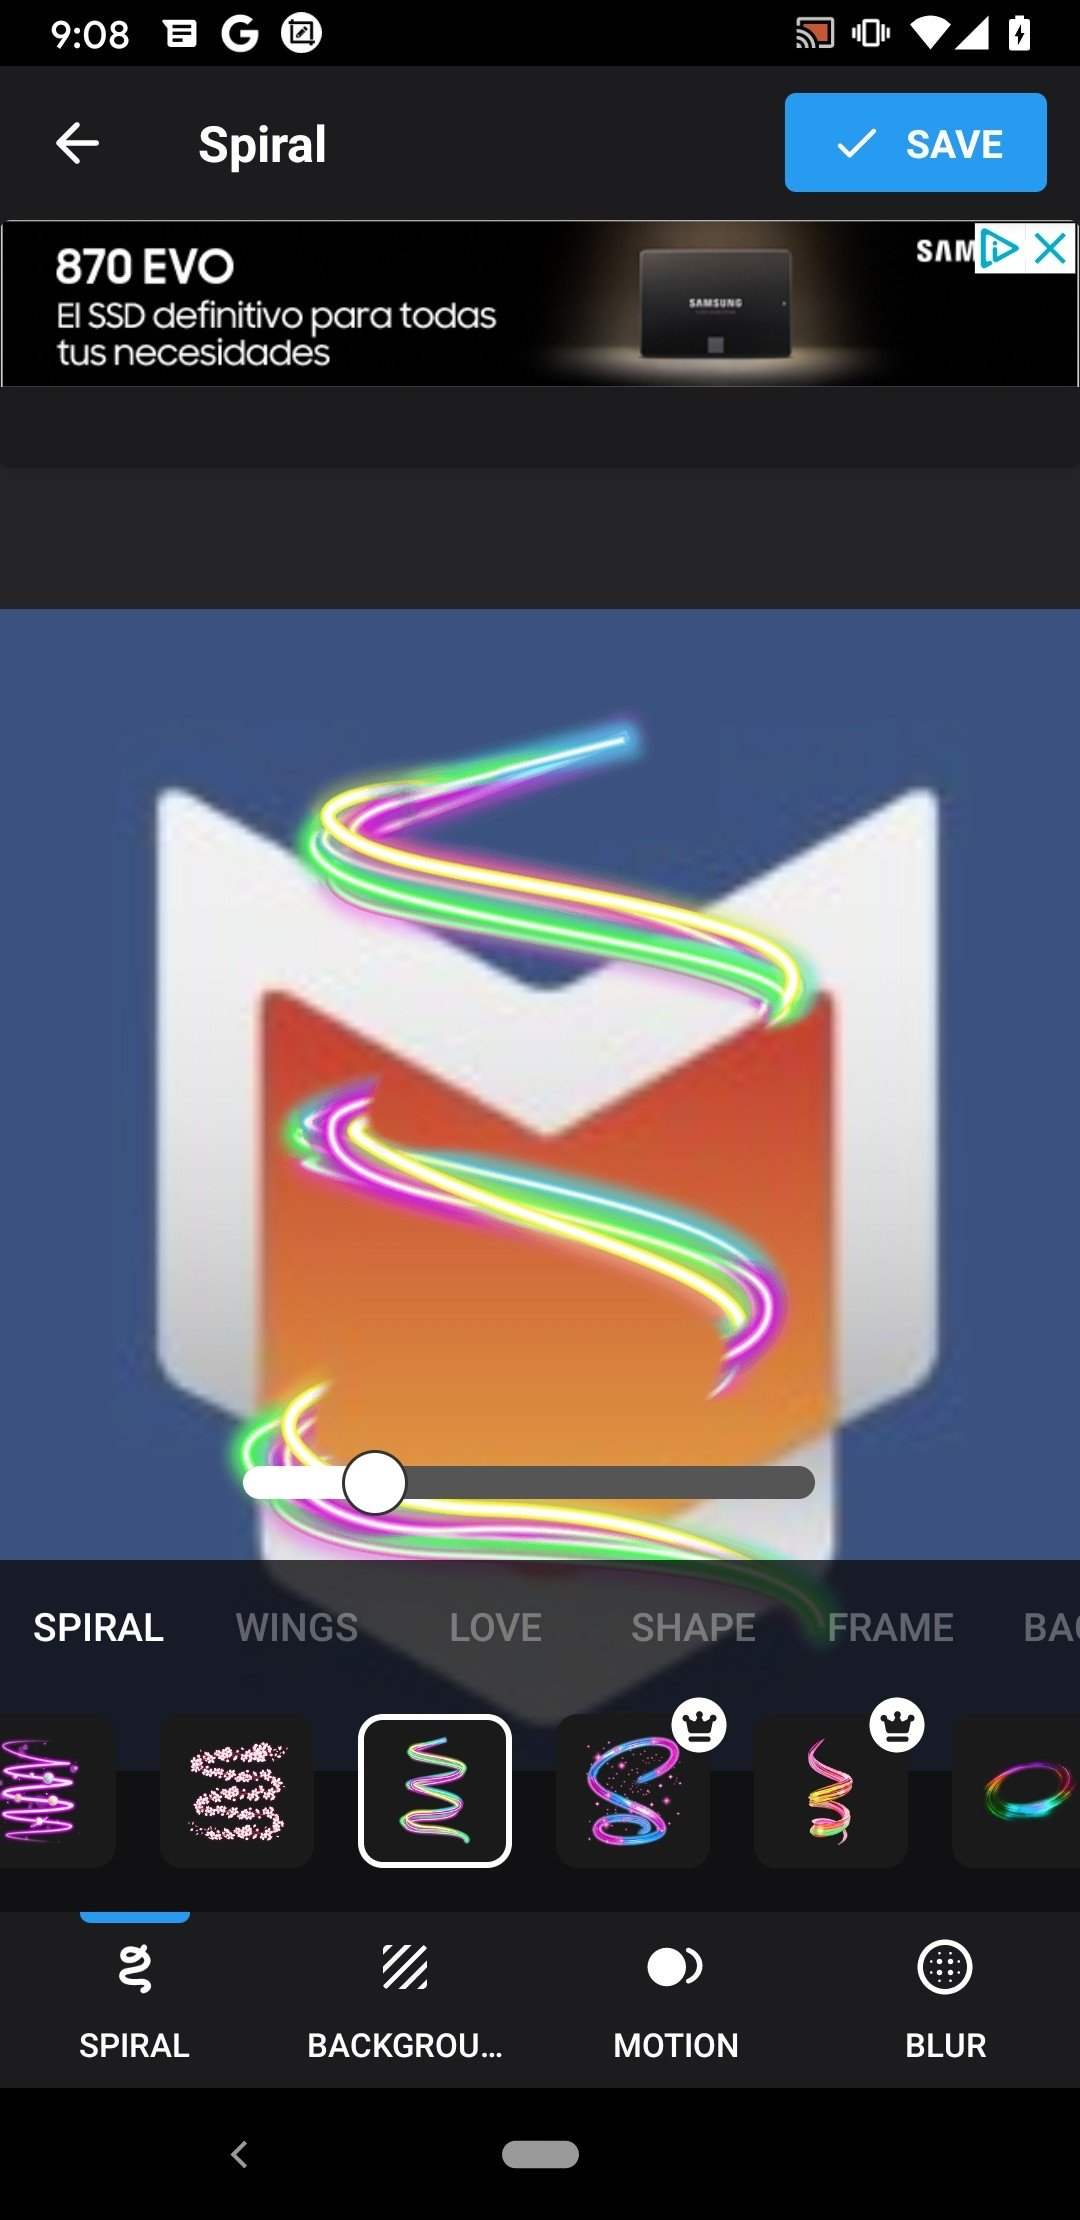 Descargar Color Photo Editor 2.0.8 para Android - APK Gratis